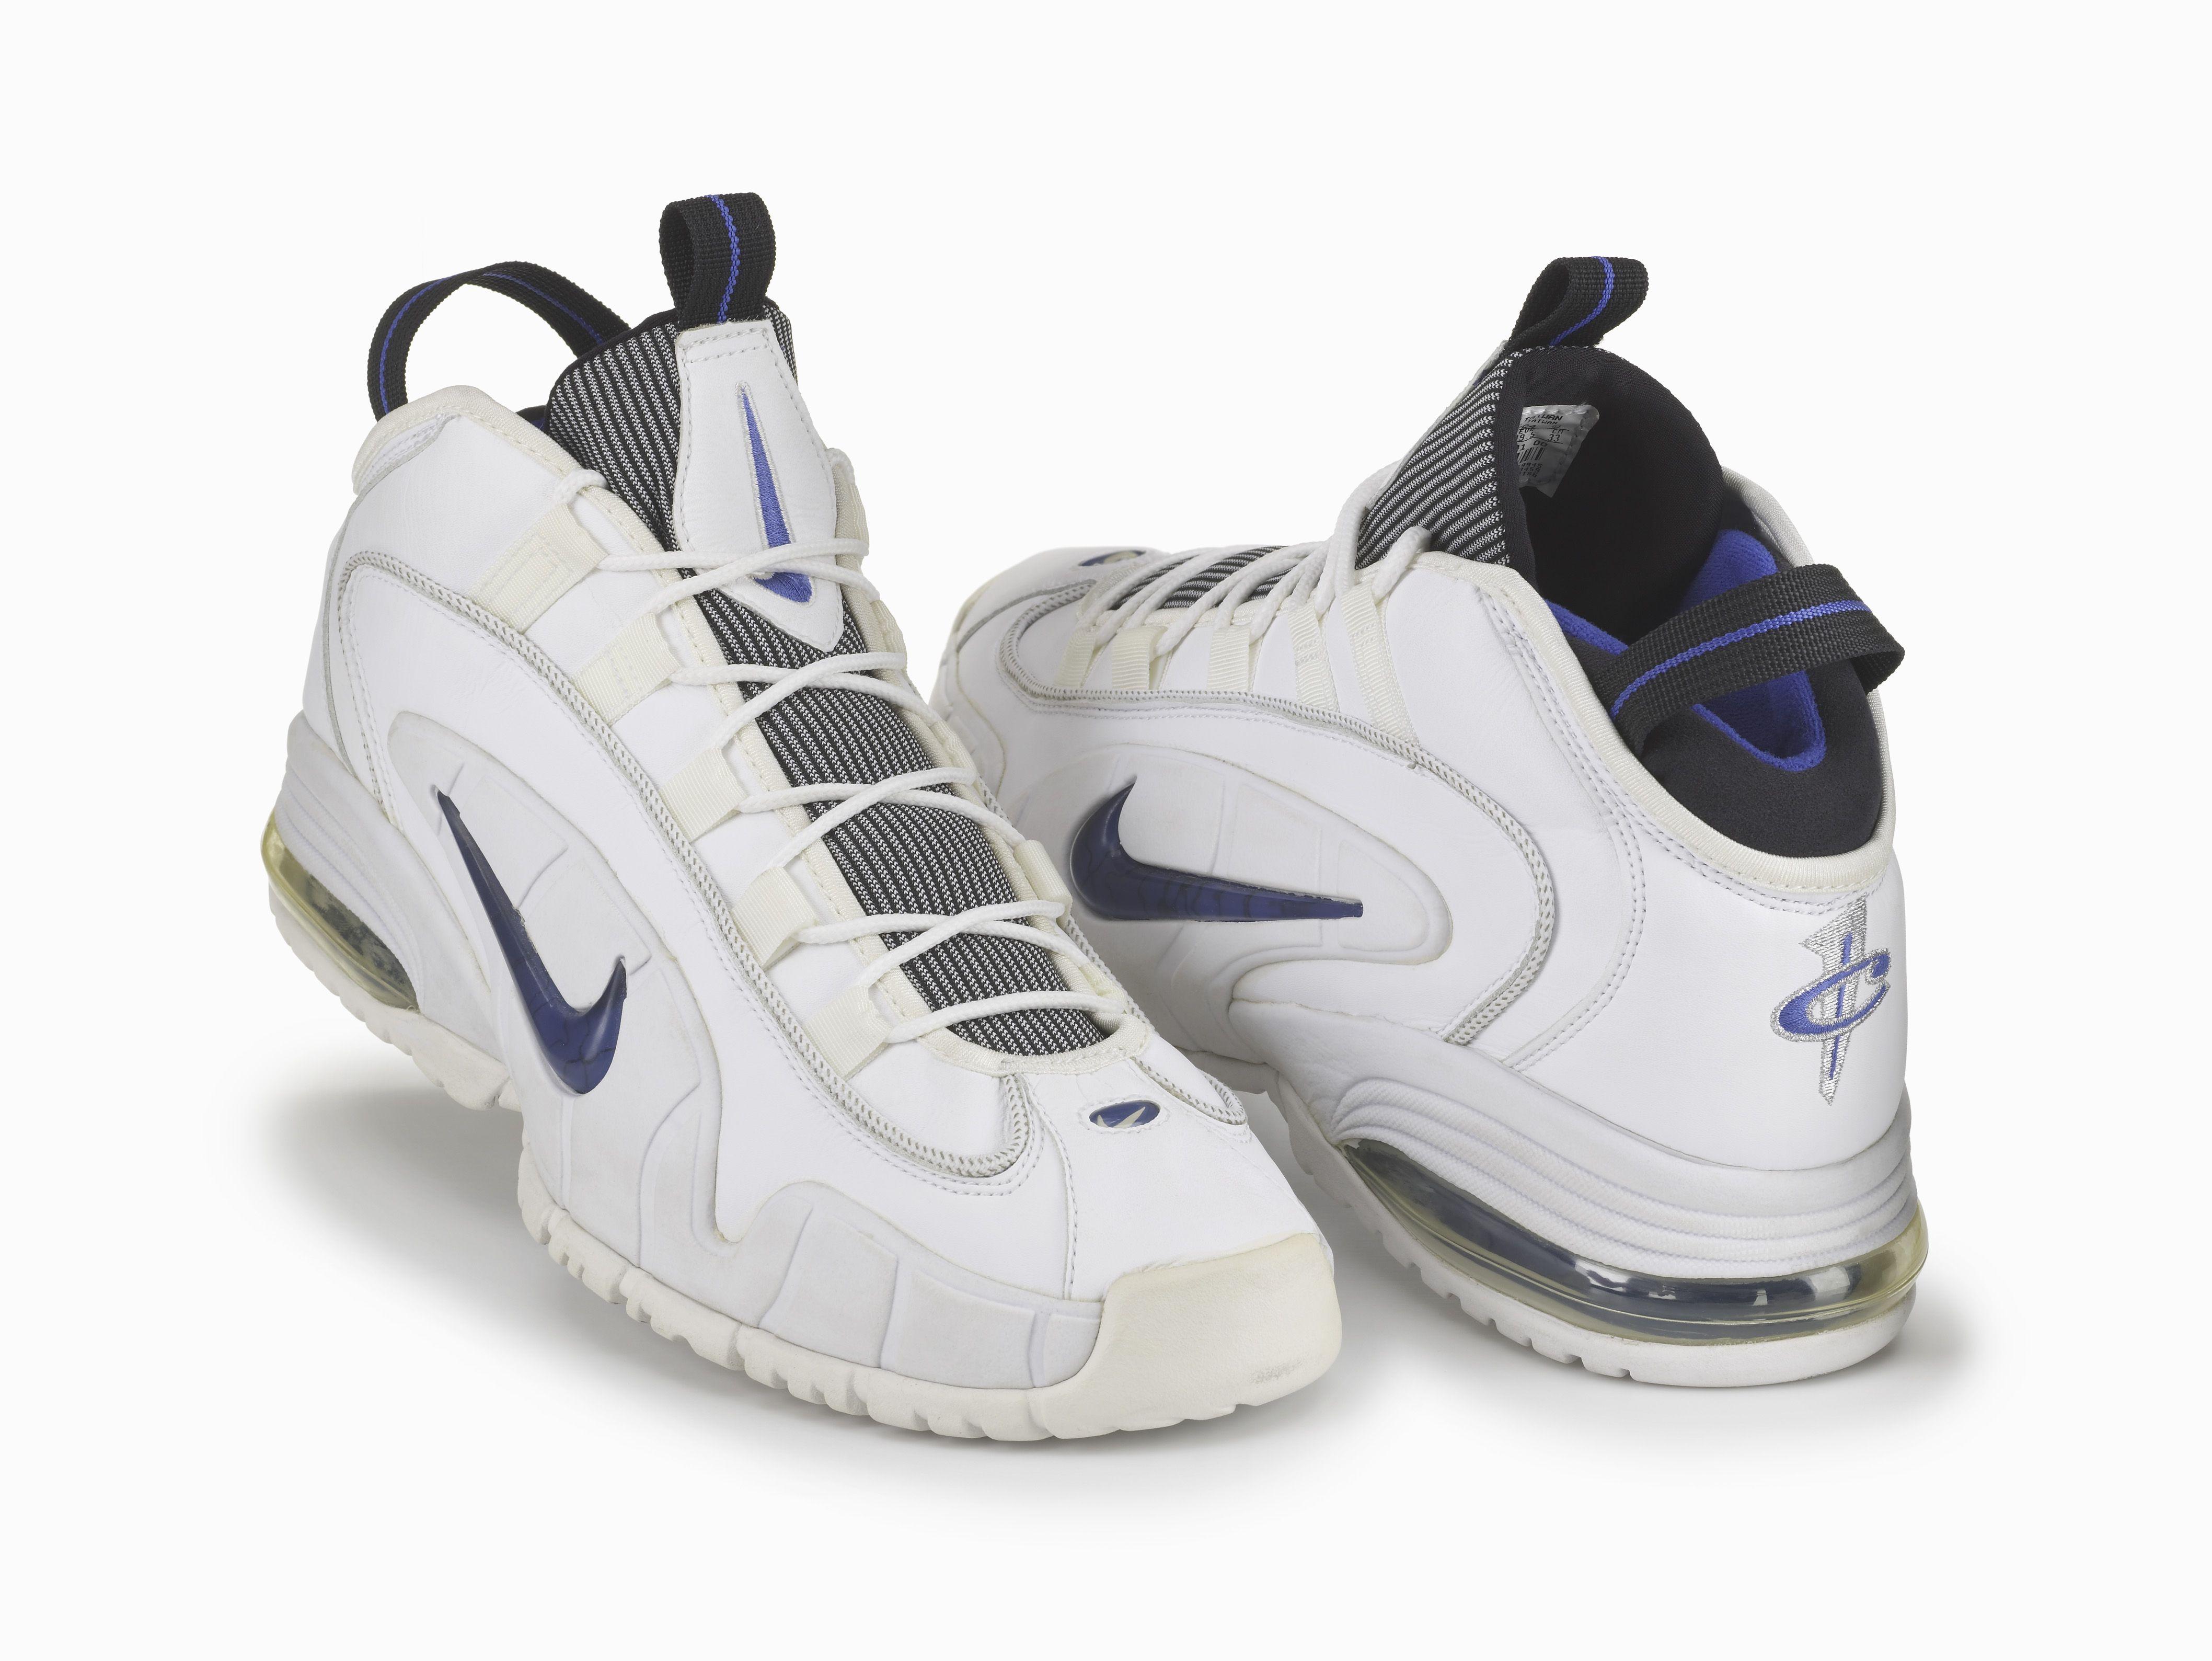 d2aeabb452f2 Nike Air Max Penny - Penny Hardaway